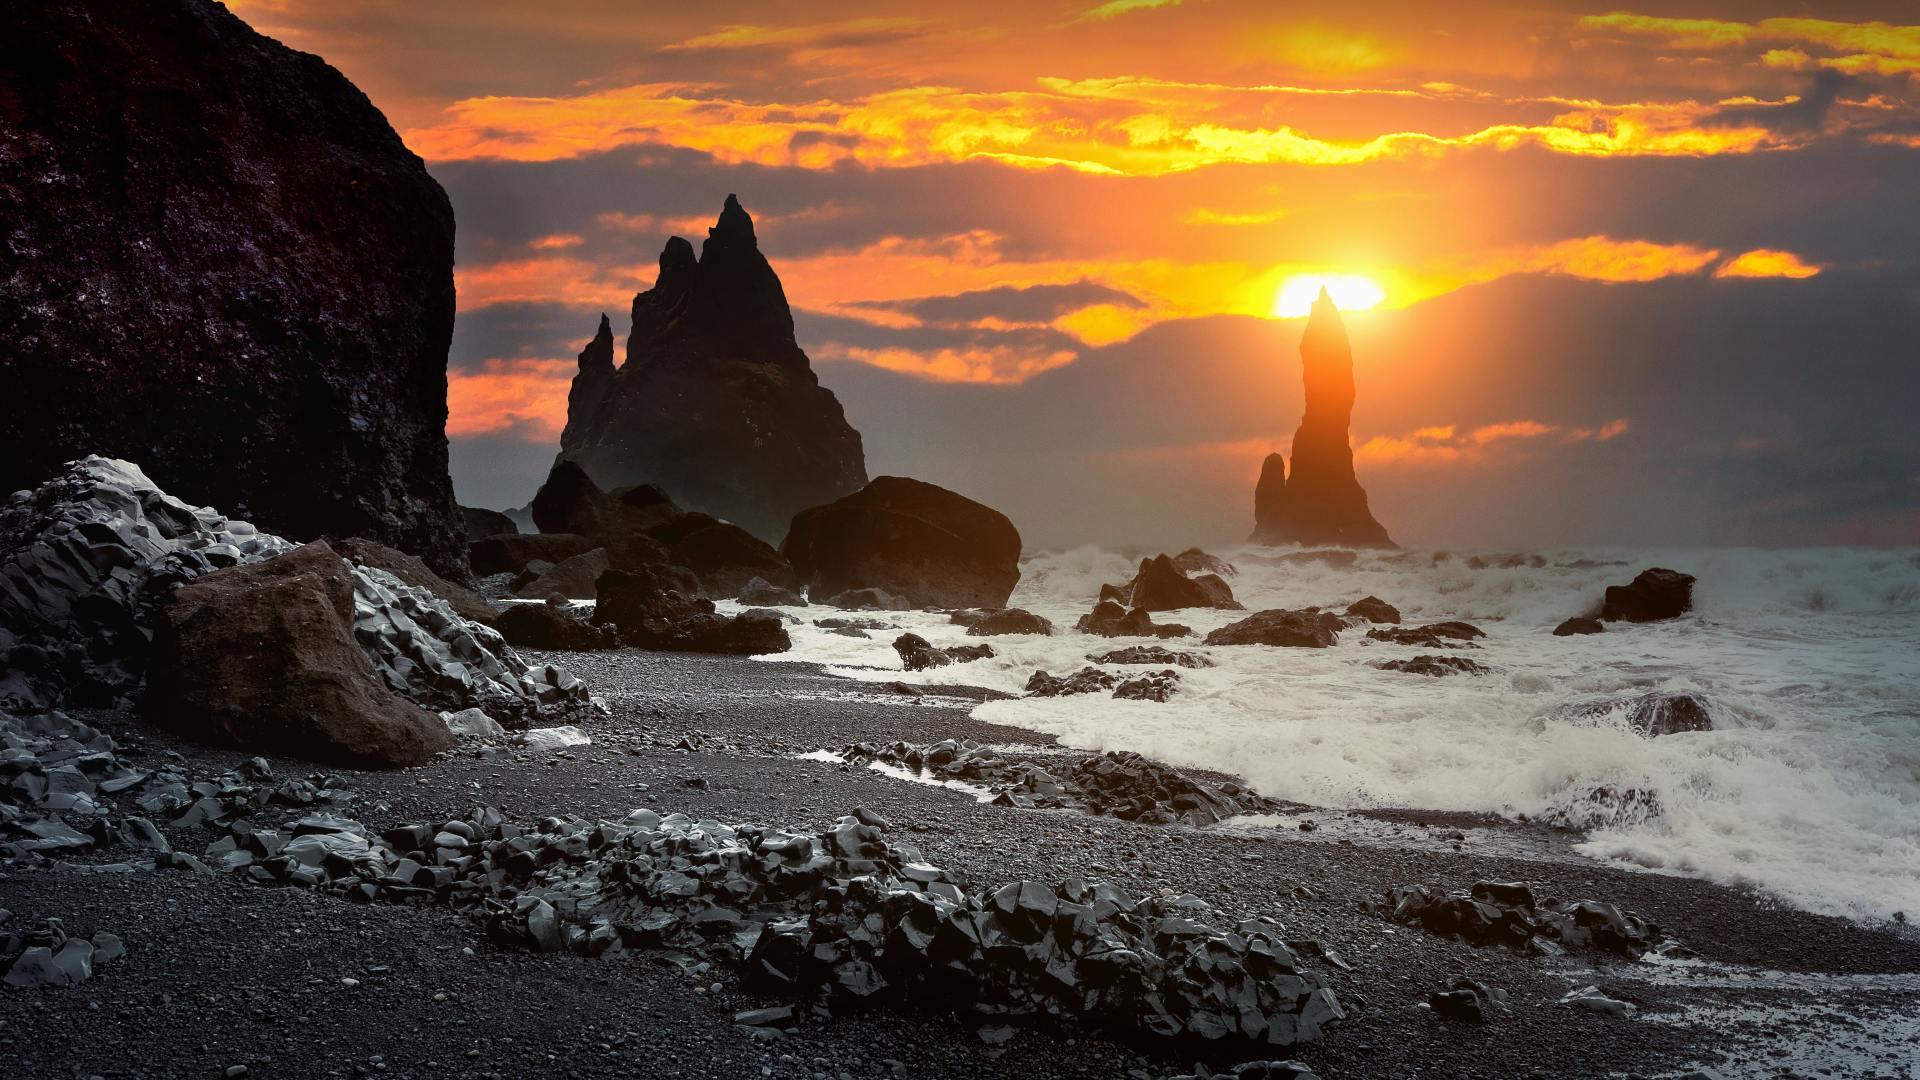 Reynisfjara with the Reynisdrangar sea stacks by sunset